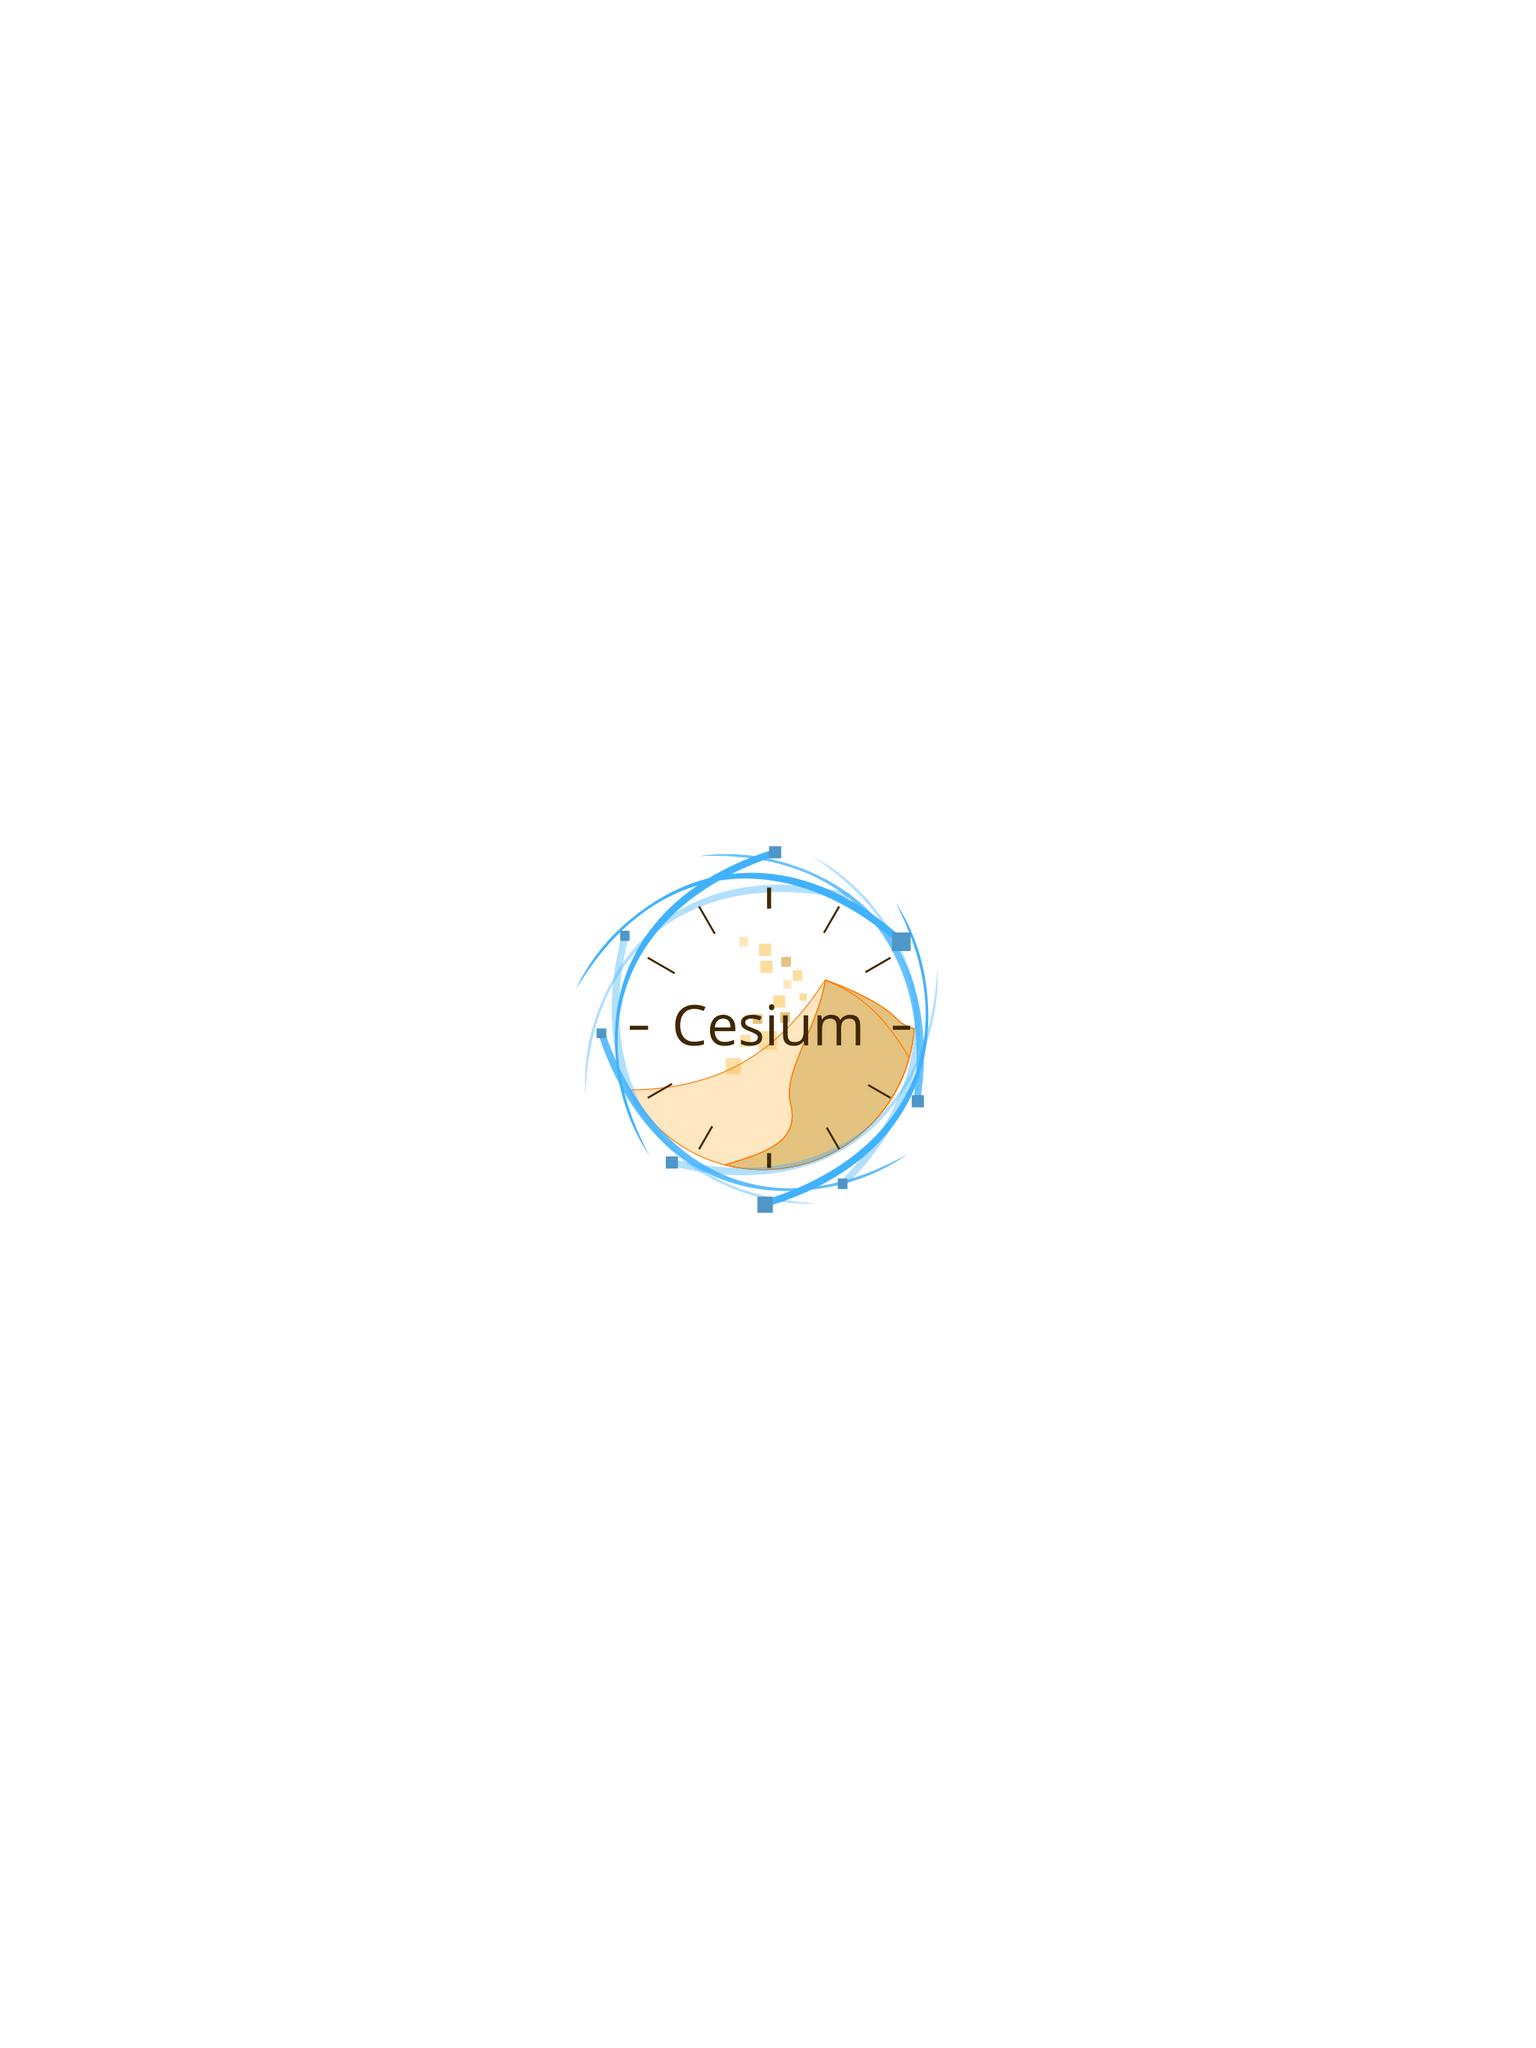 resources/ios/splash/Default-Portrait@2x~ipad.png